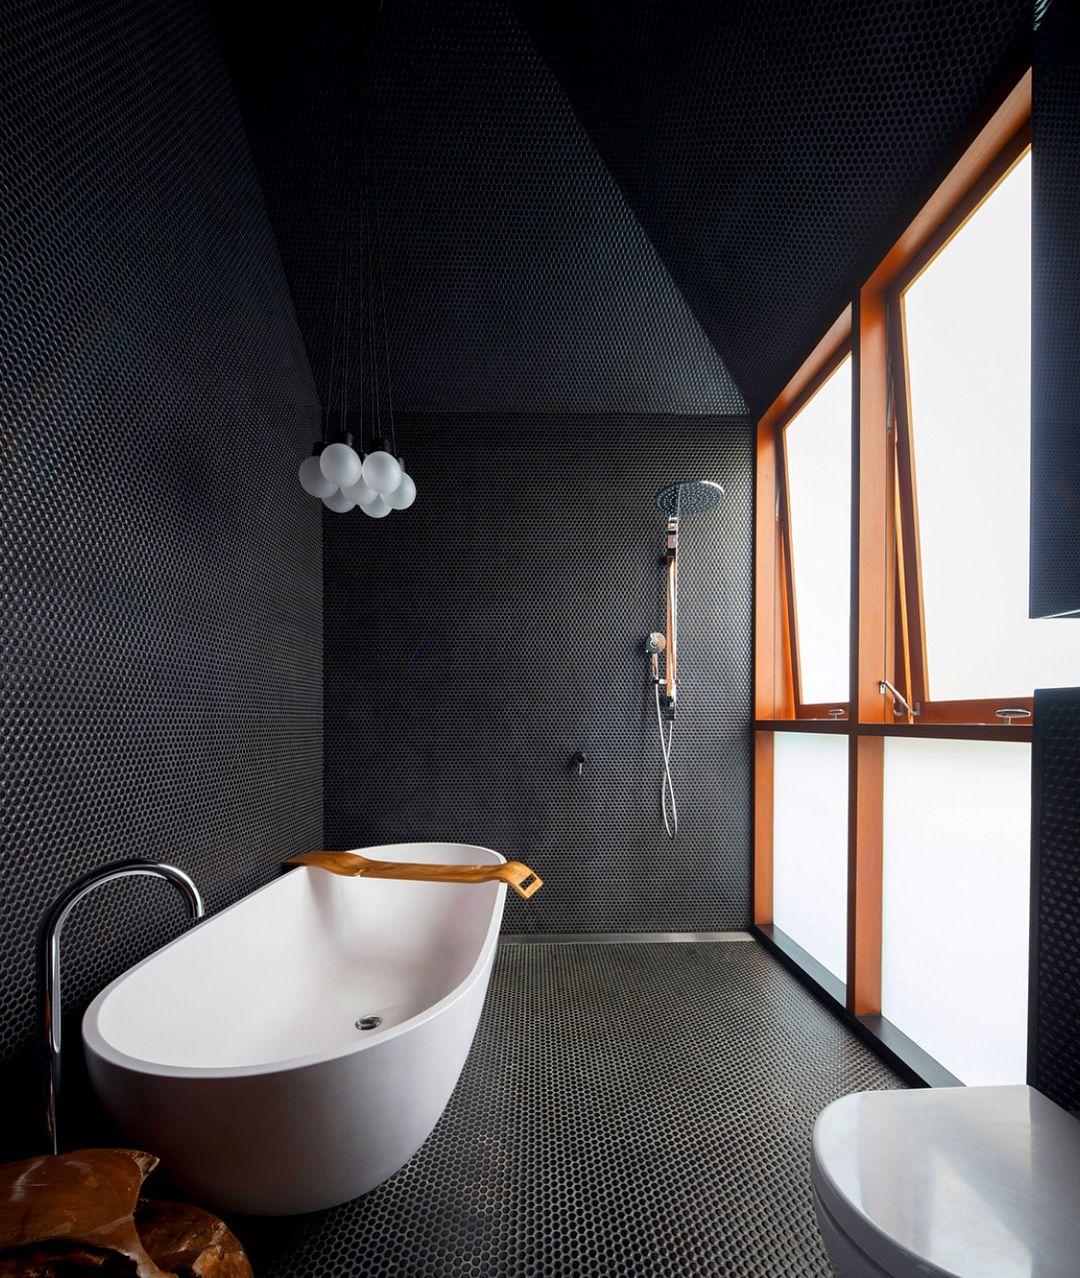 Fascinating 28 Home Decor Product Black Bathroom Dark Interior Design Simple Bathroom Designs